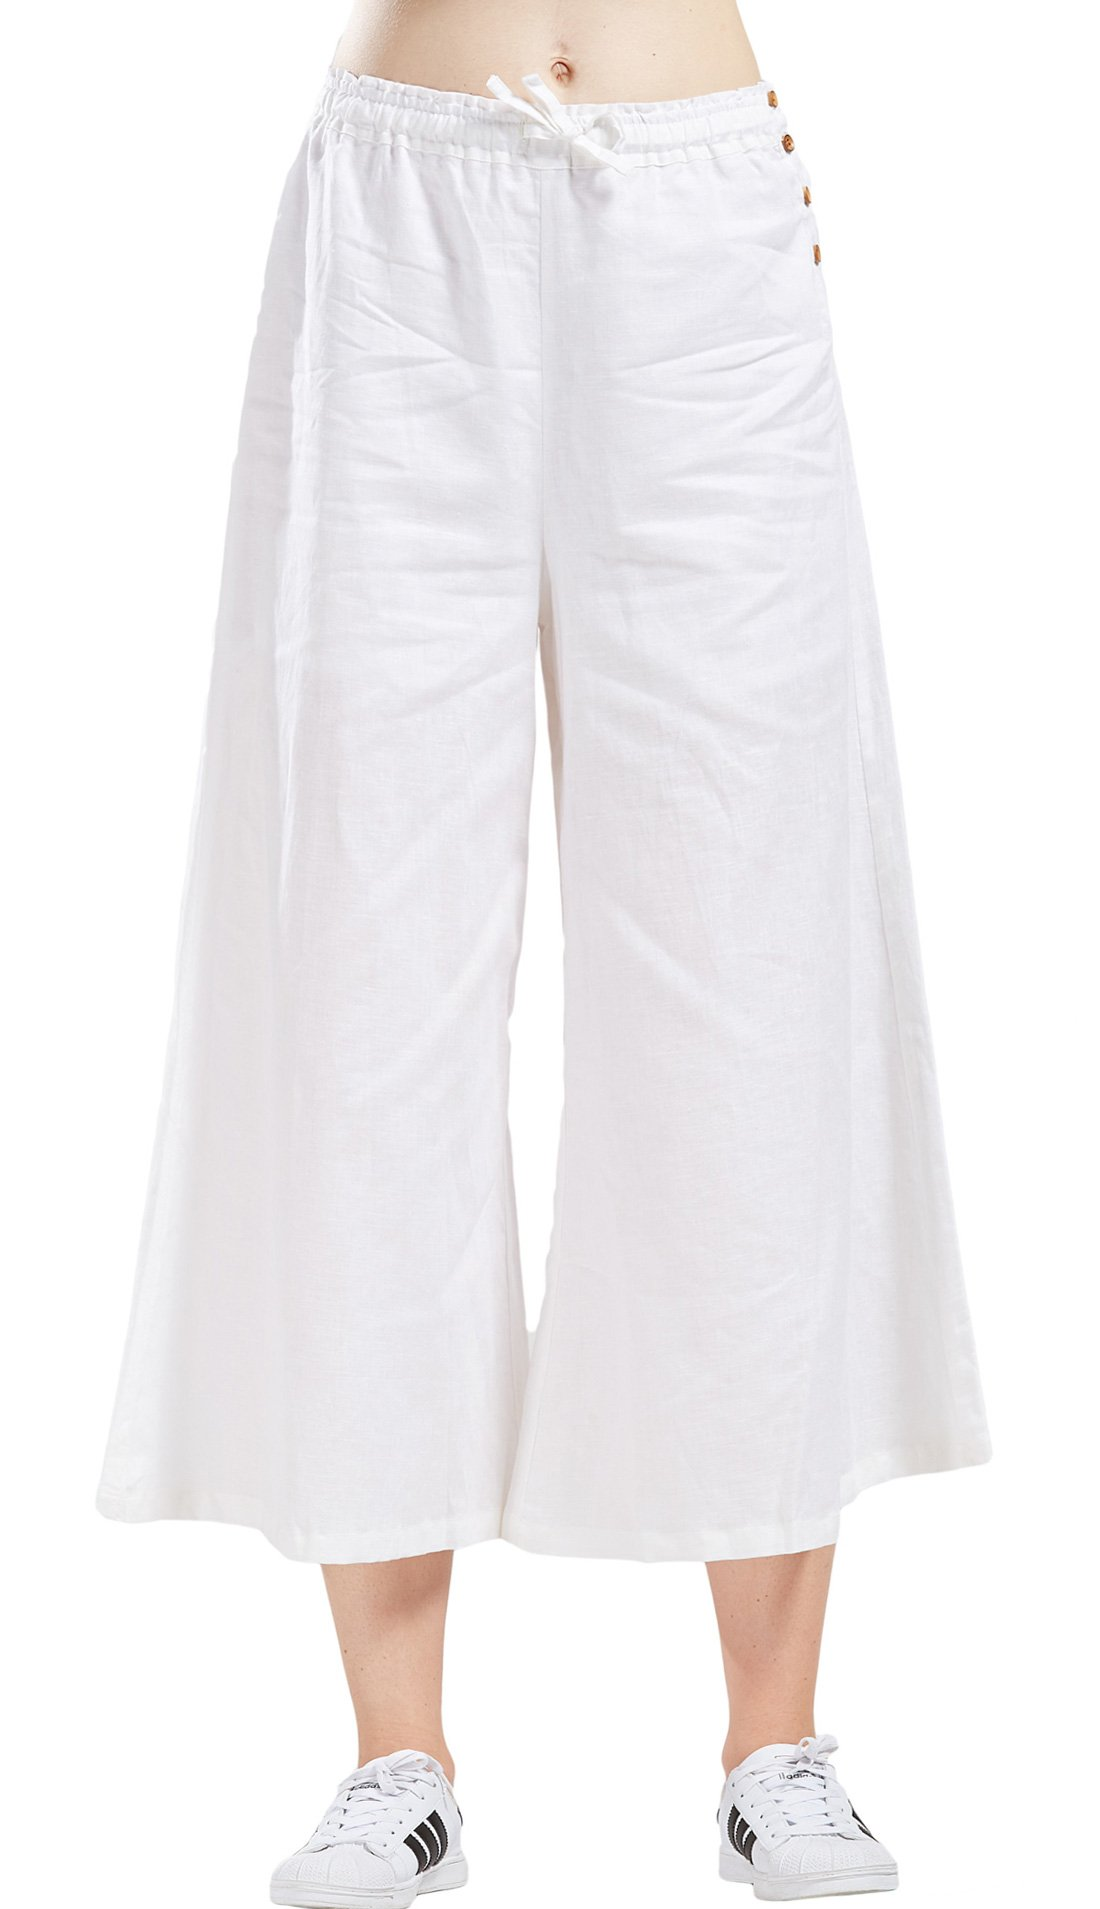 utcoco Women's Summer Elastic Waist Loose Fit Cropped Plazzo Linen Beach Pants (X-Large, White)